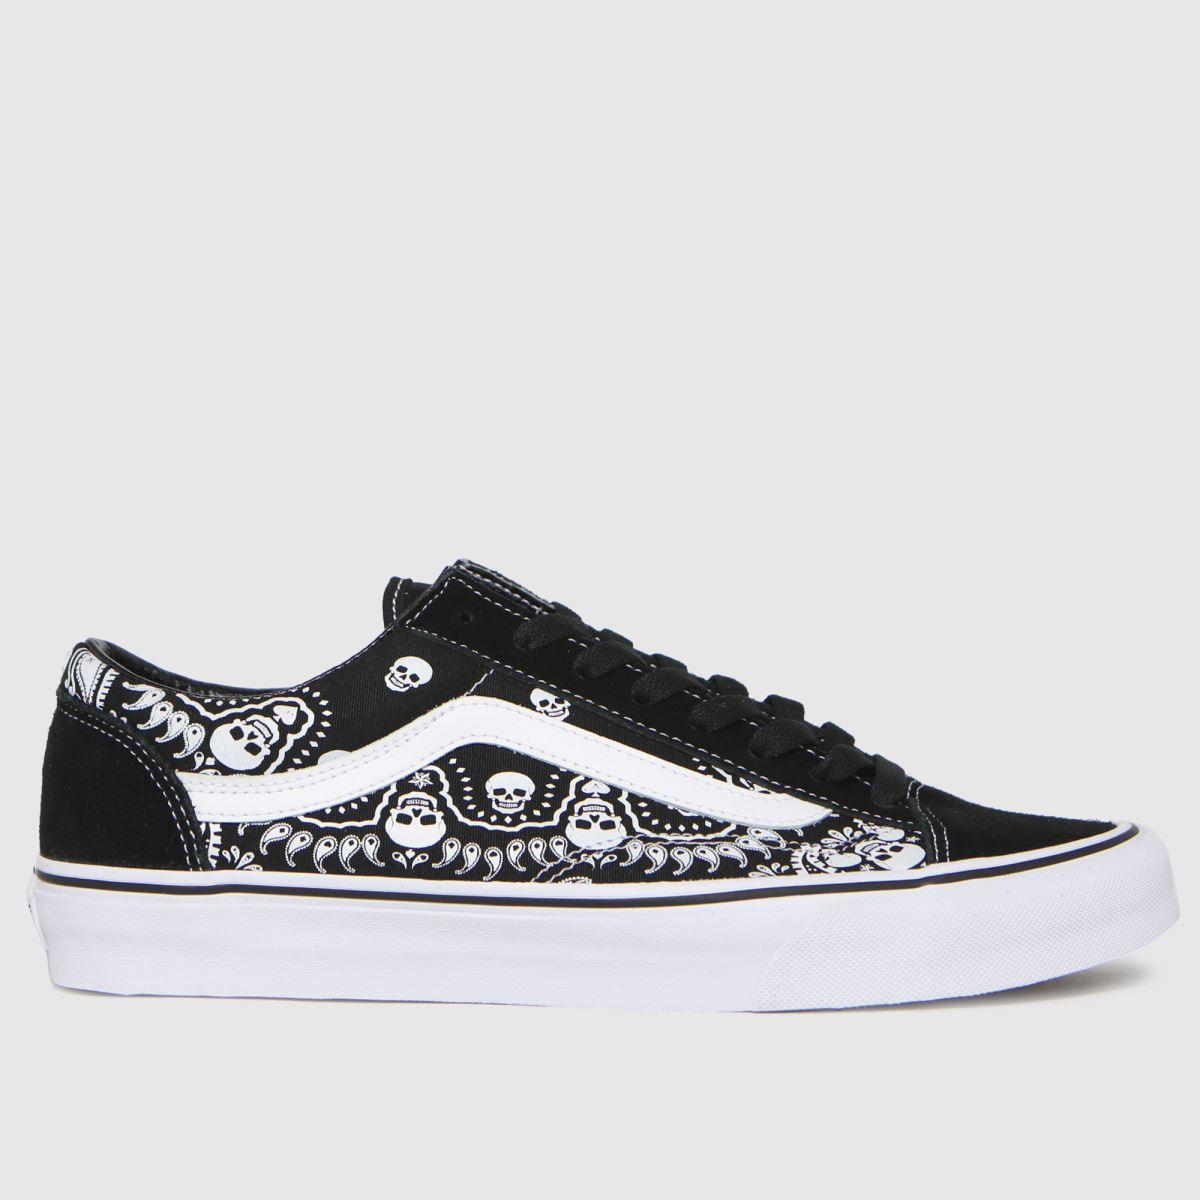 Vans Black & White Style 36 Bandana Trainers